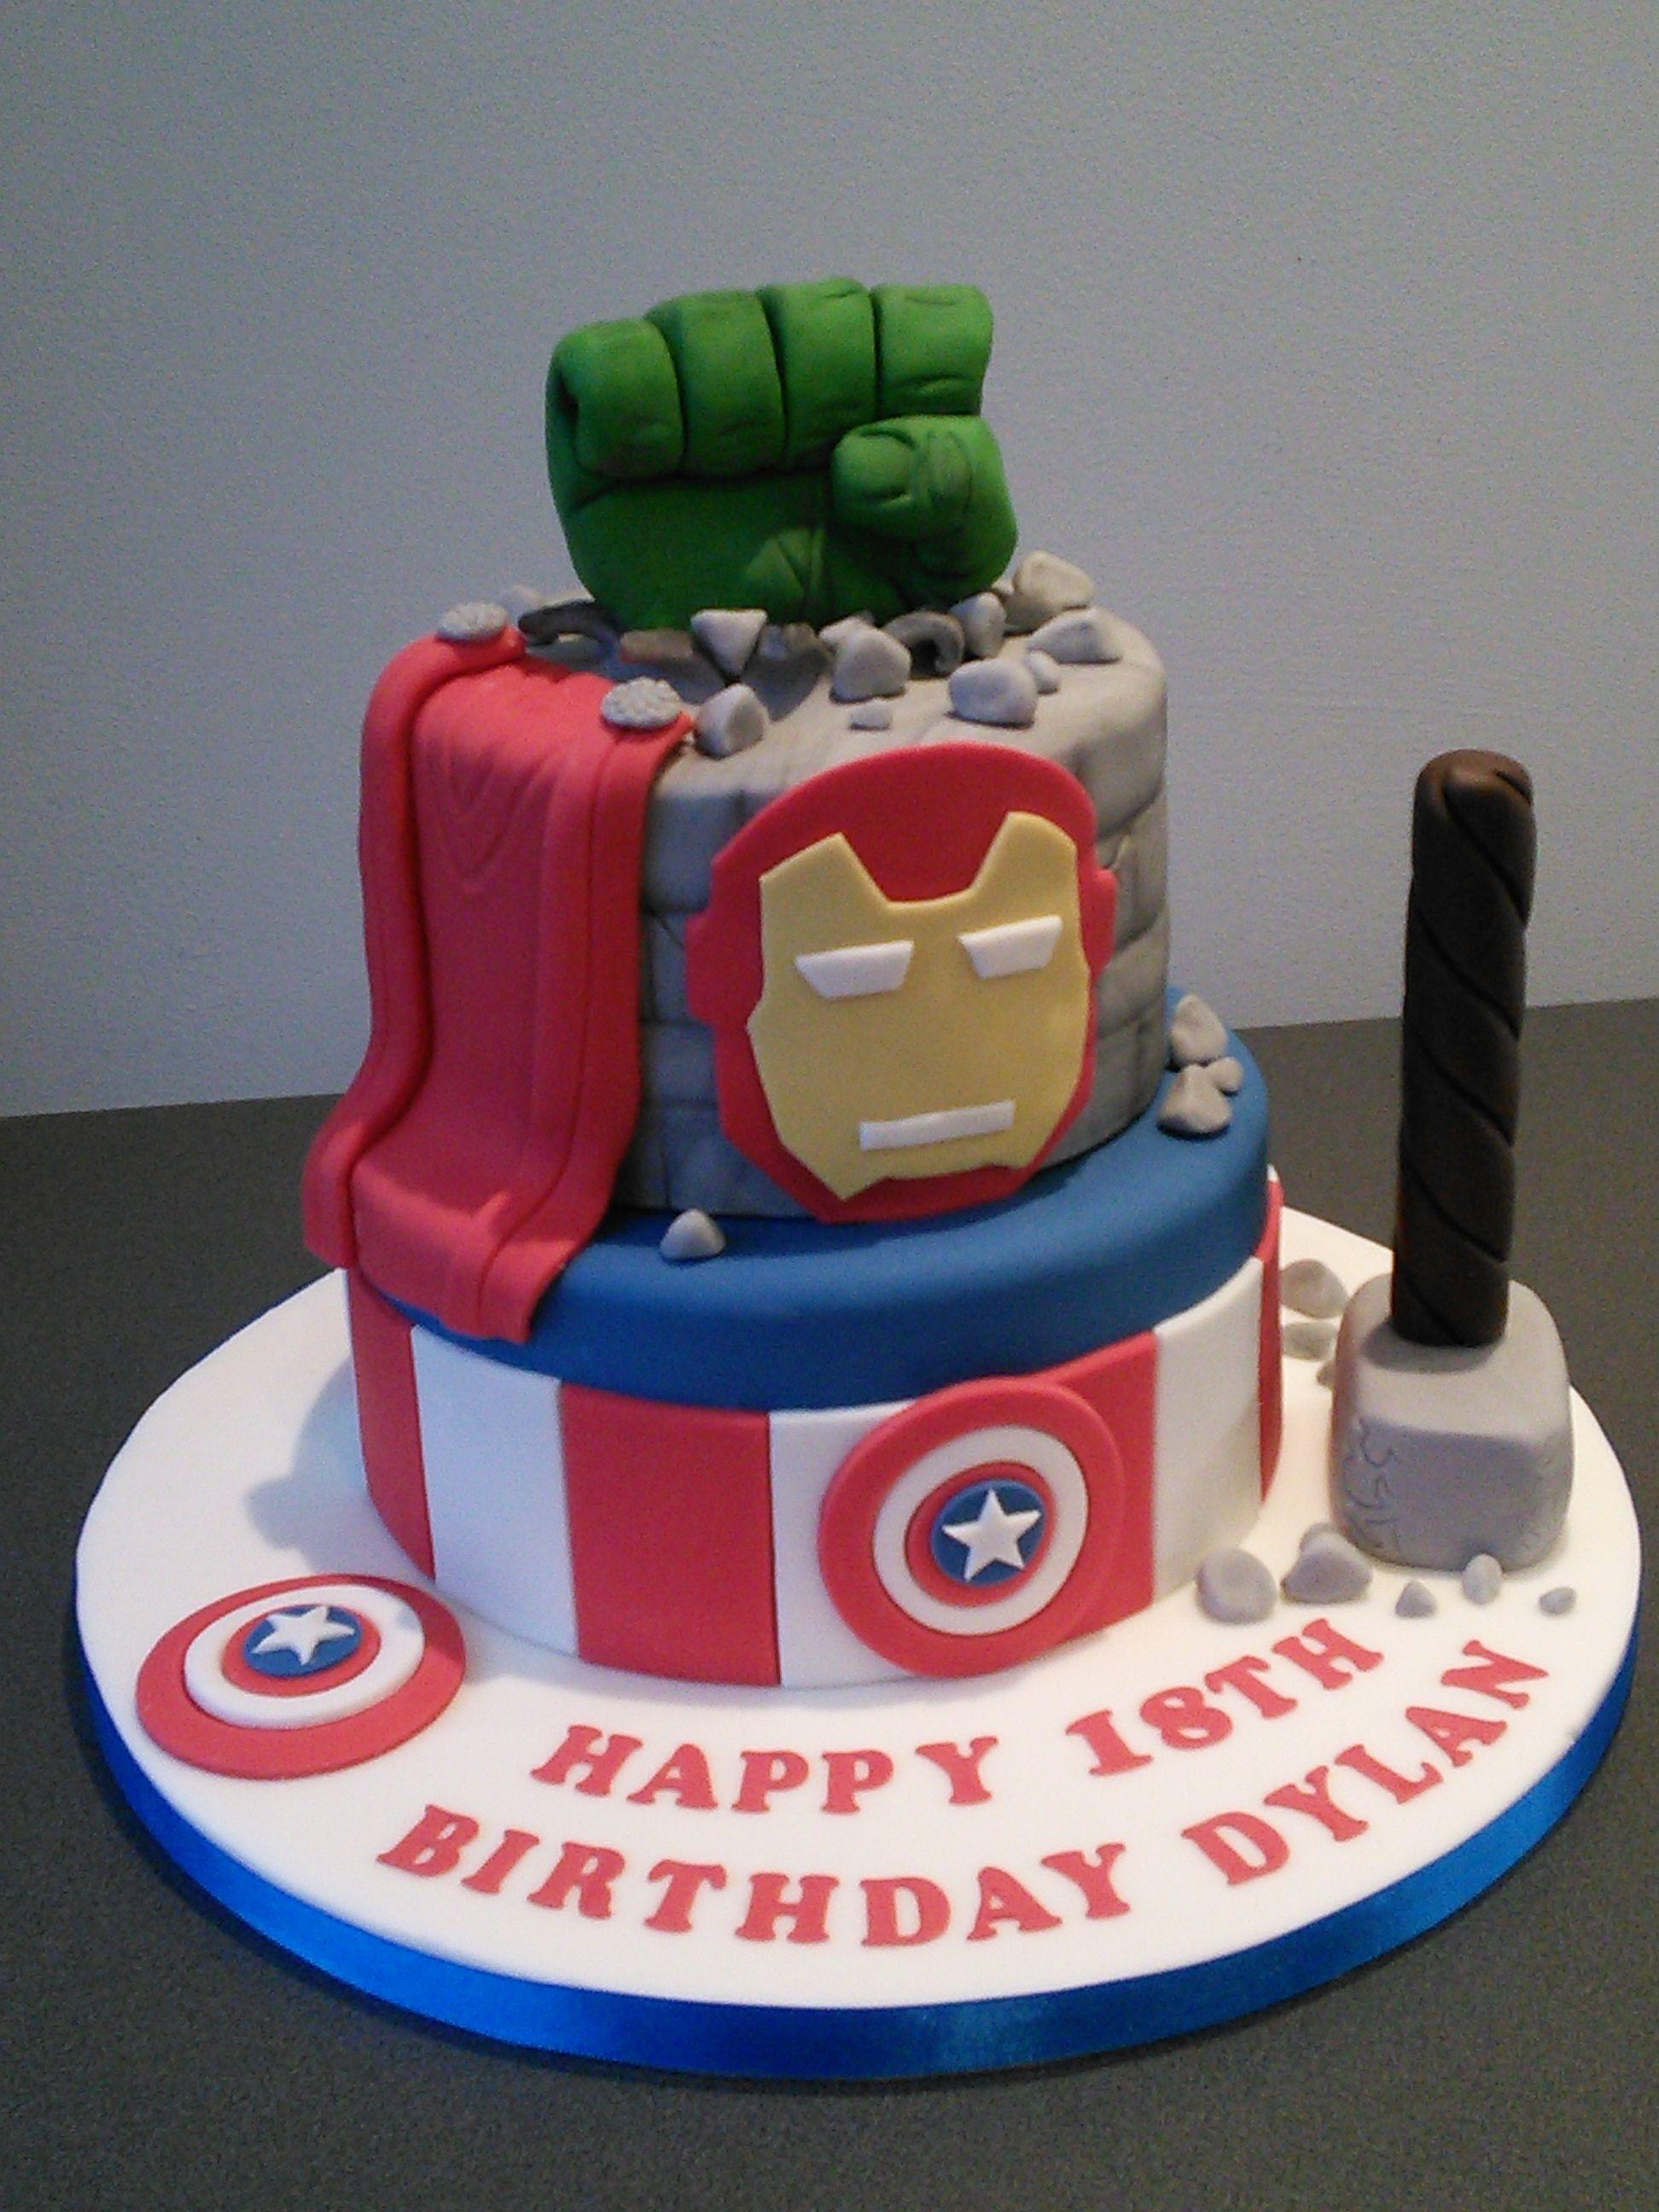 Marvel Superhero 18th Birthday Cake With Captain America Thor And